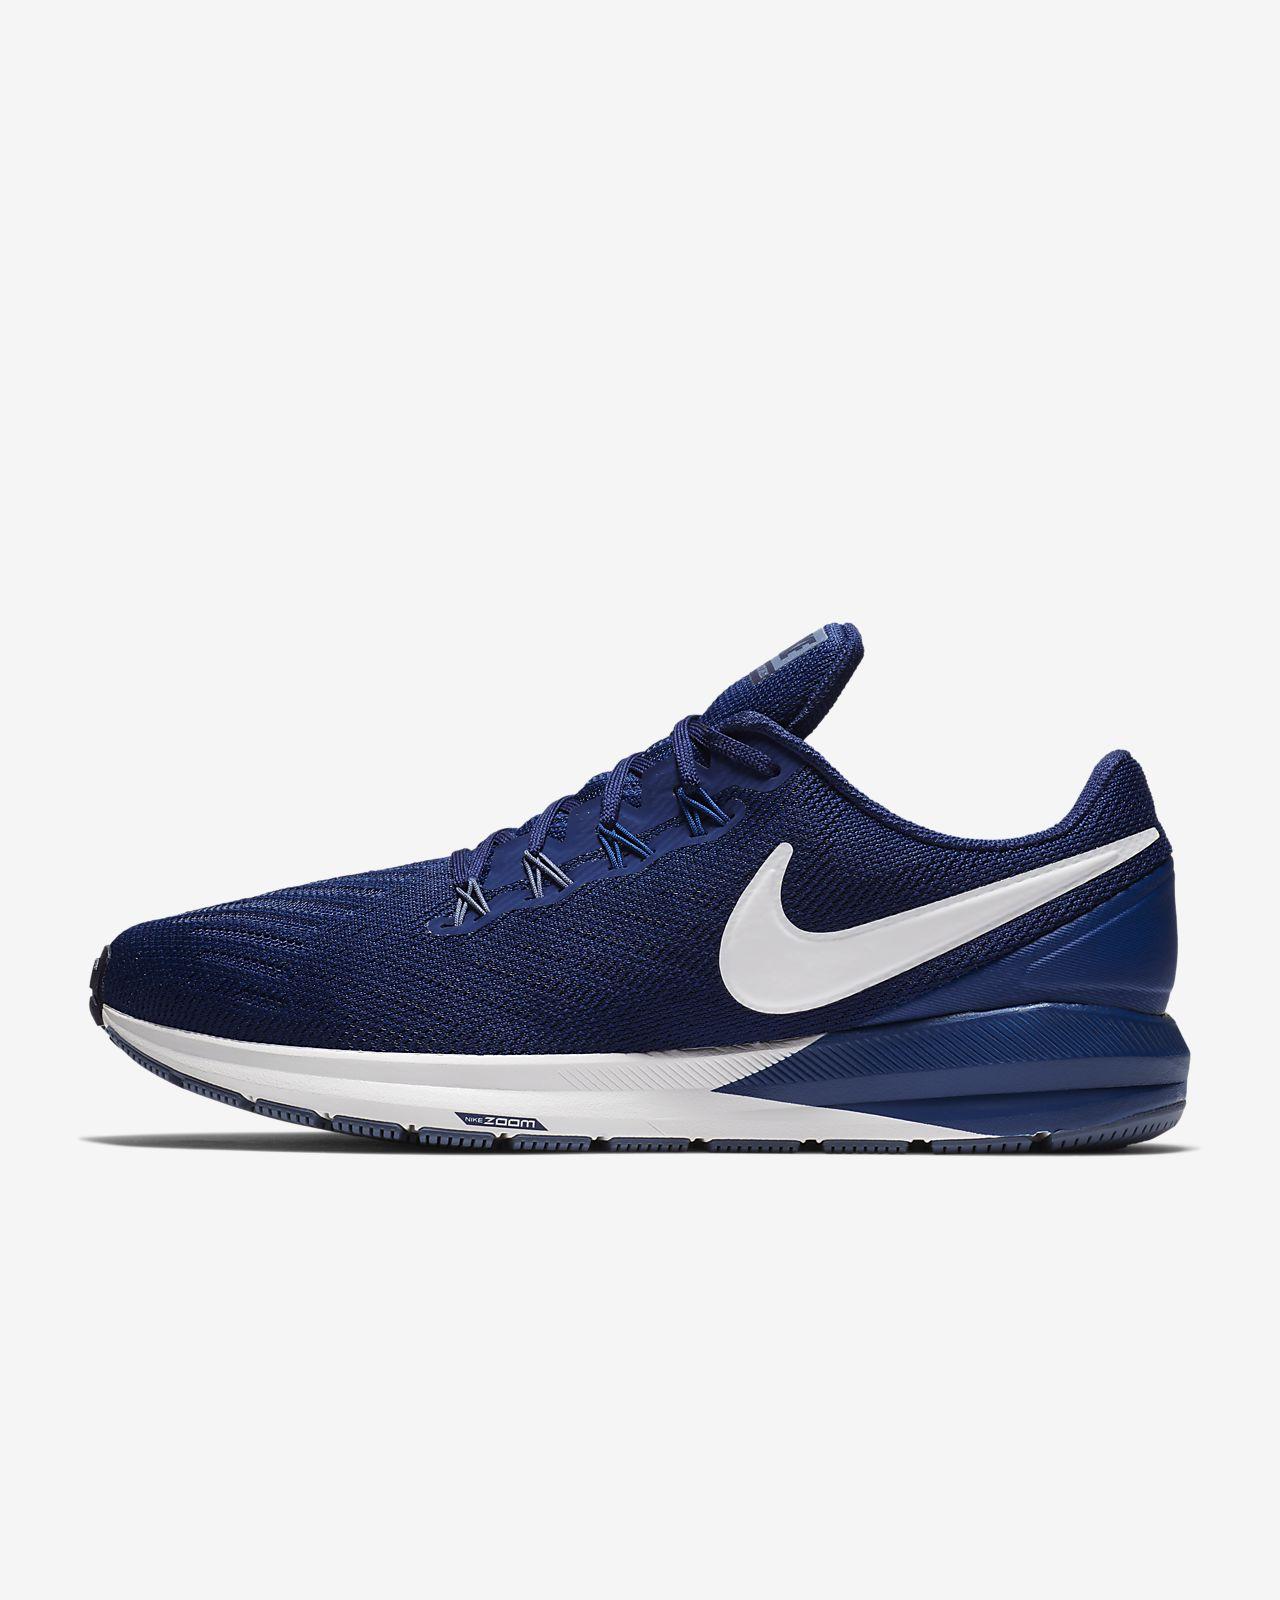 hot sale online 13dd1 22c72 Nike Air Zoom Structure 22 Men's Running Shoe